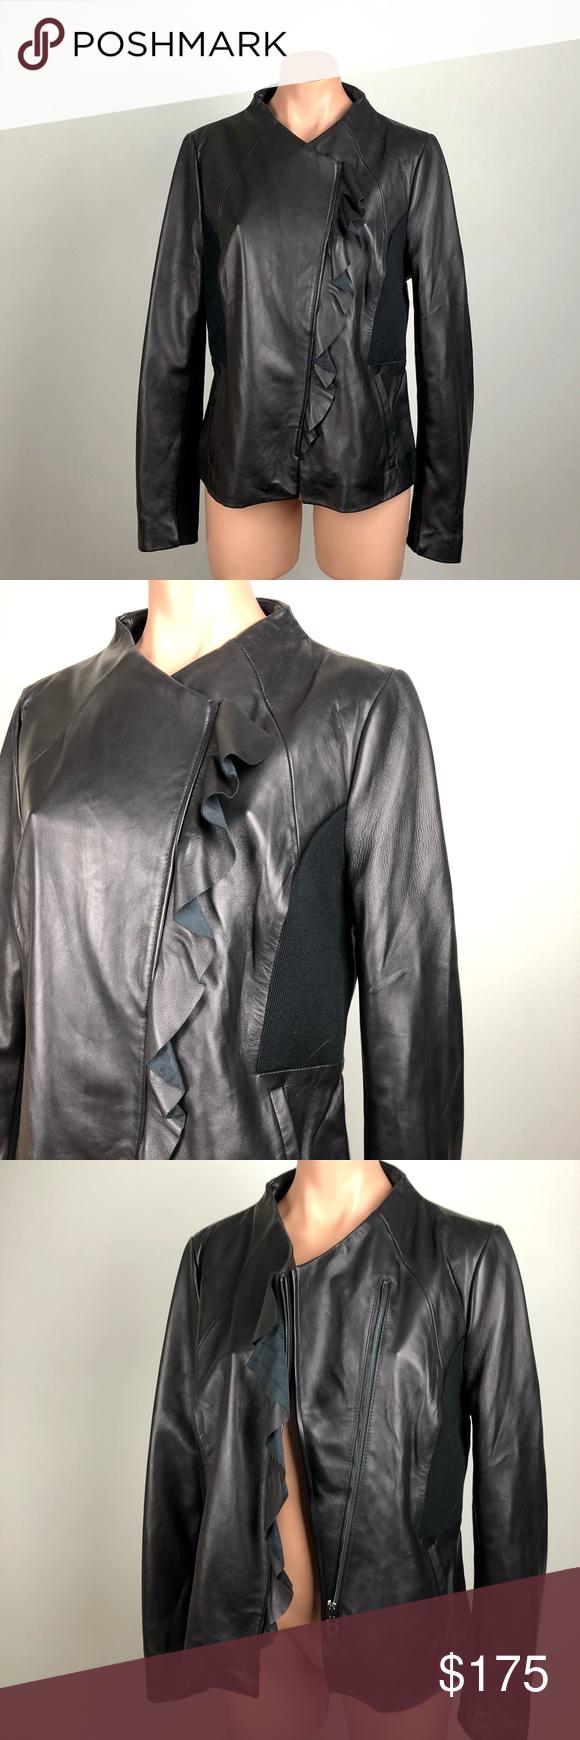 Nwotstylish Elie Tahari Fiona Black Leather Jacket Leather Jacket Women Brown Lamb Leather Jacket Leather Jackets Women [ 1740 x 580 Pixel ]